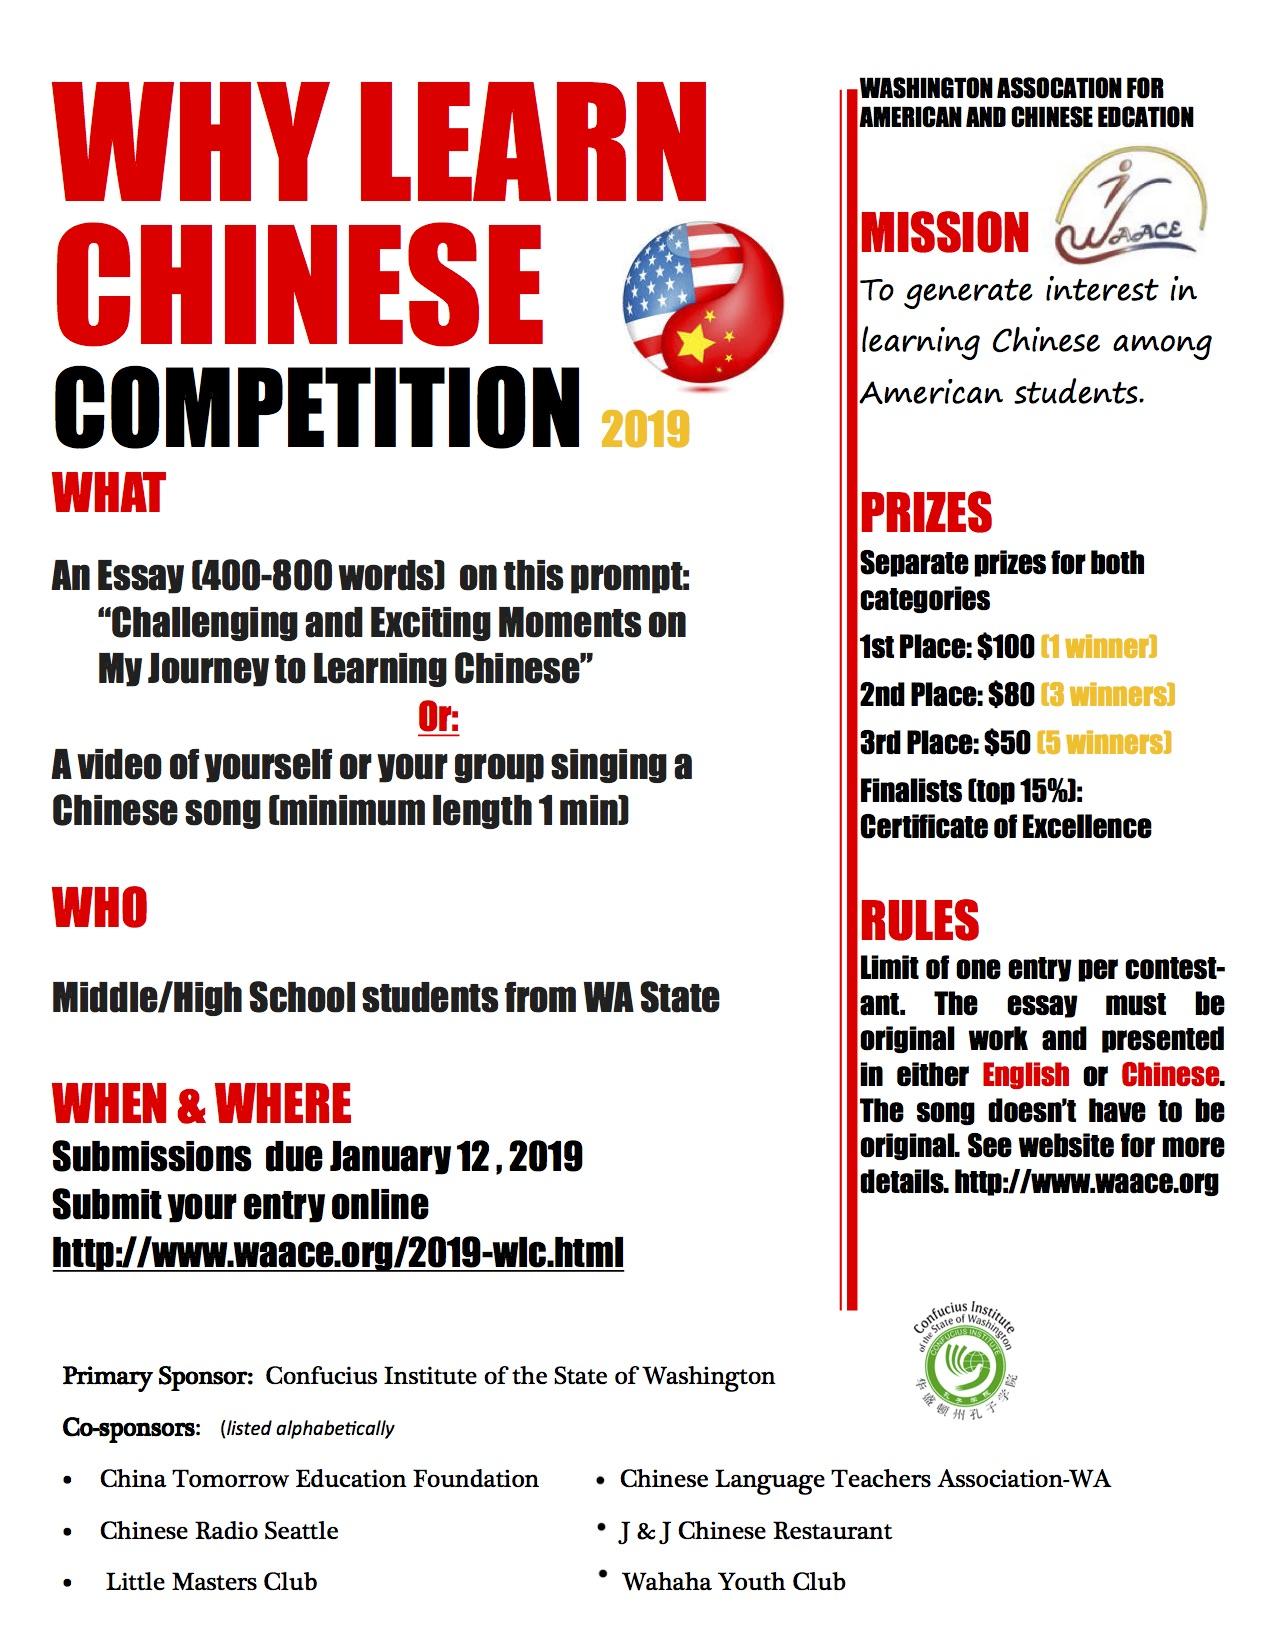 020 Essay Example Wlc2019 Flyer Img Amazing Chinese Art Topics Vce Formats Sheet Full